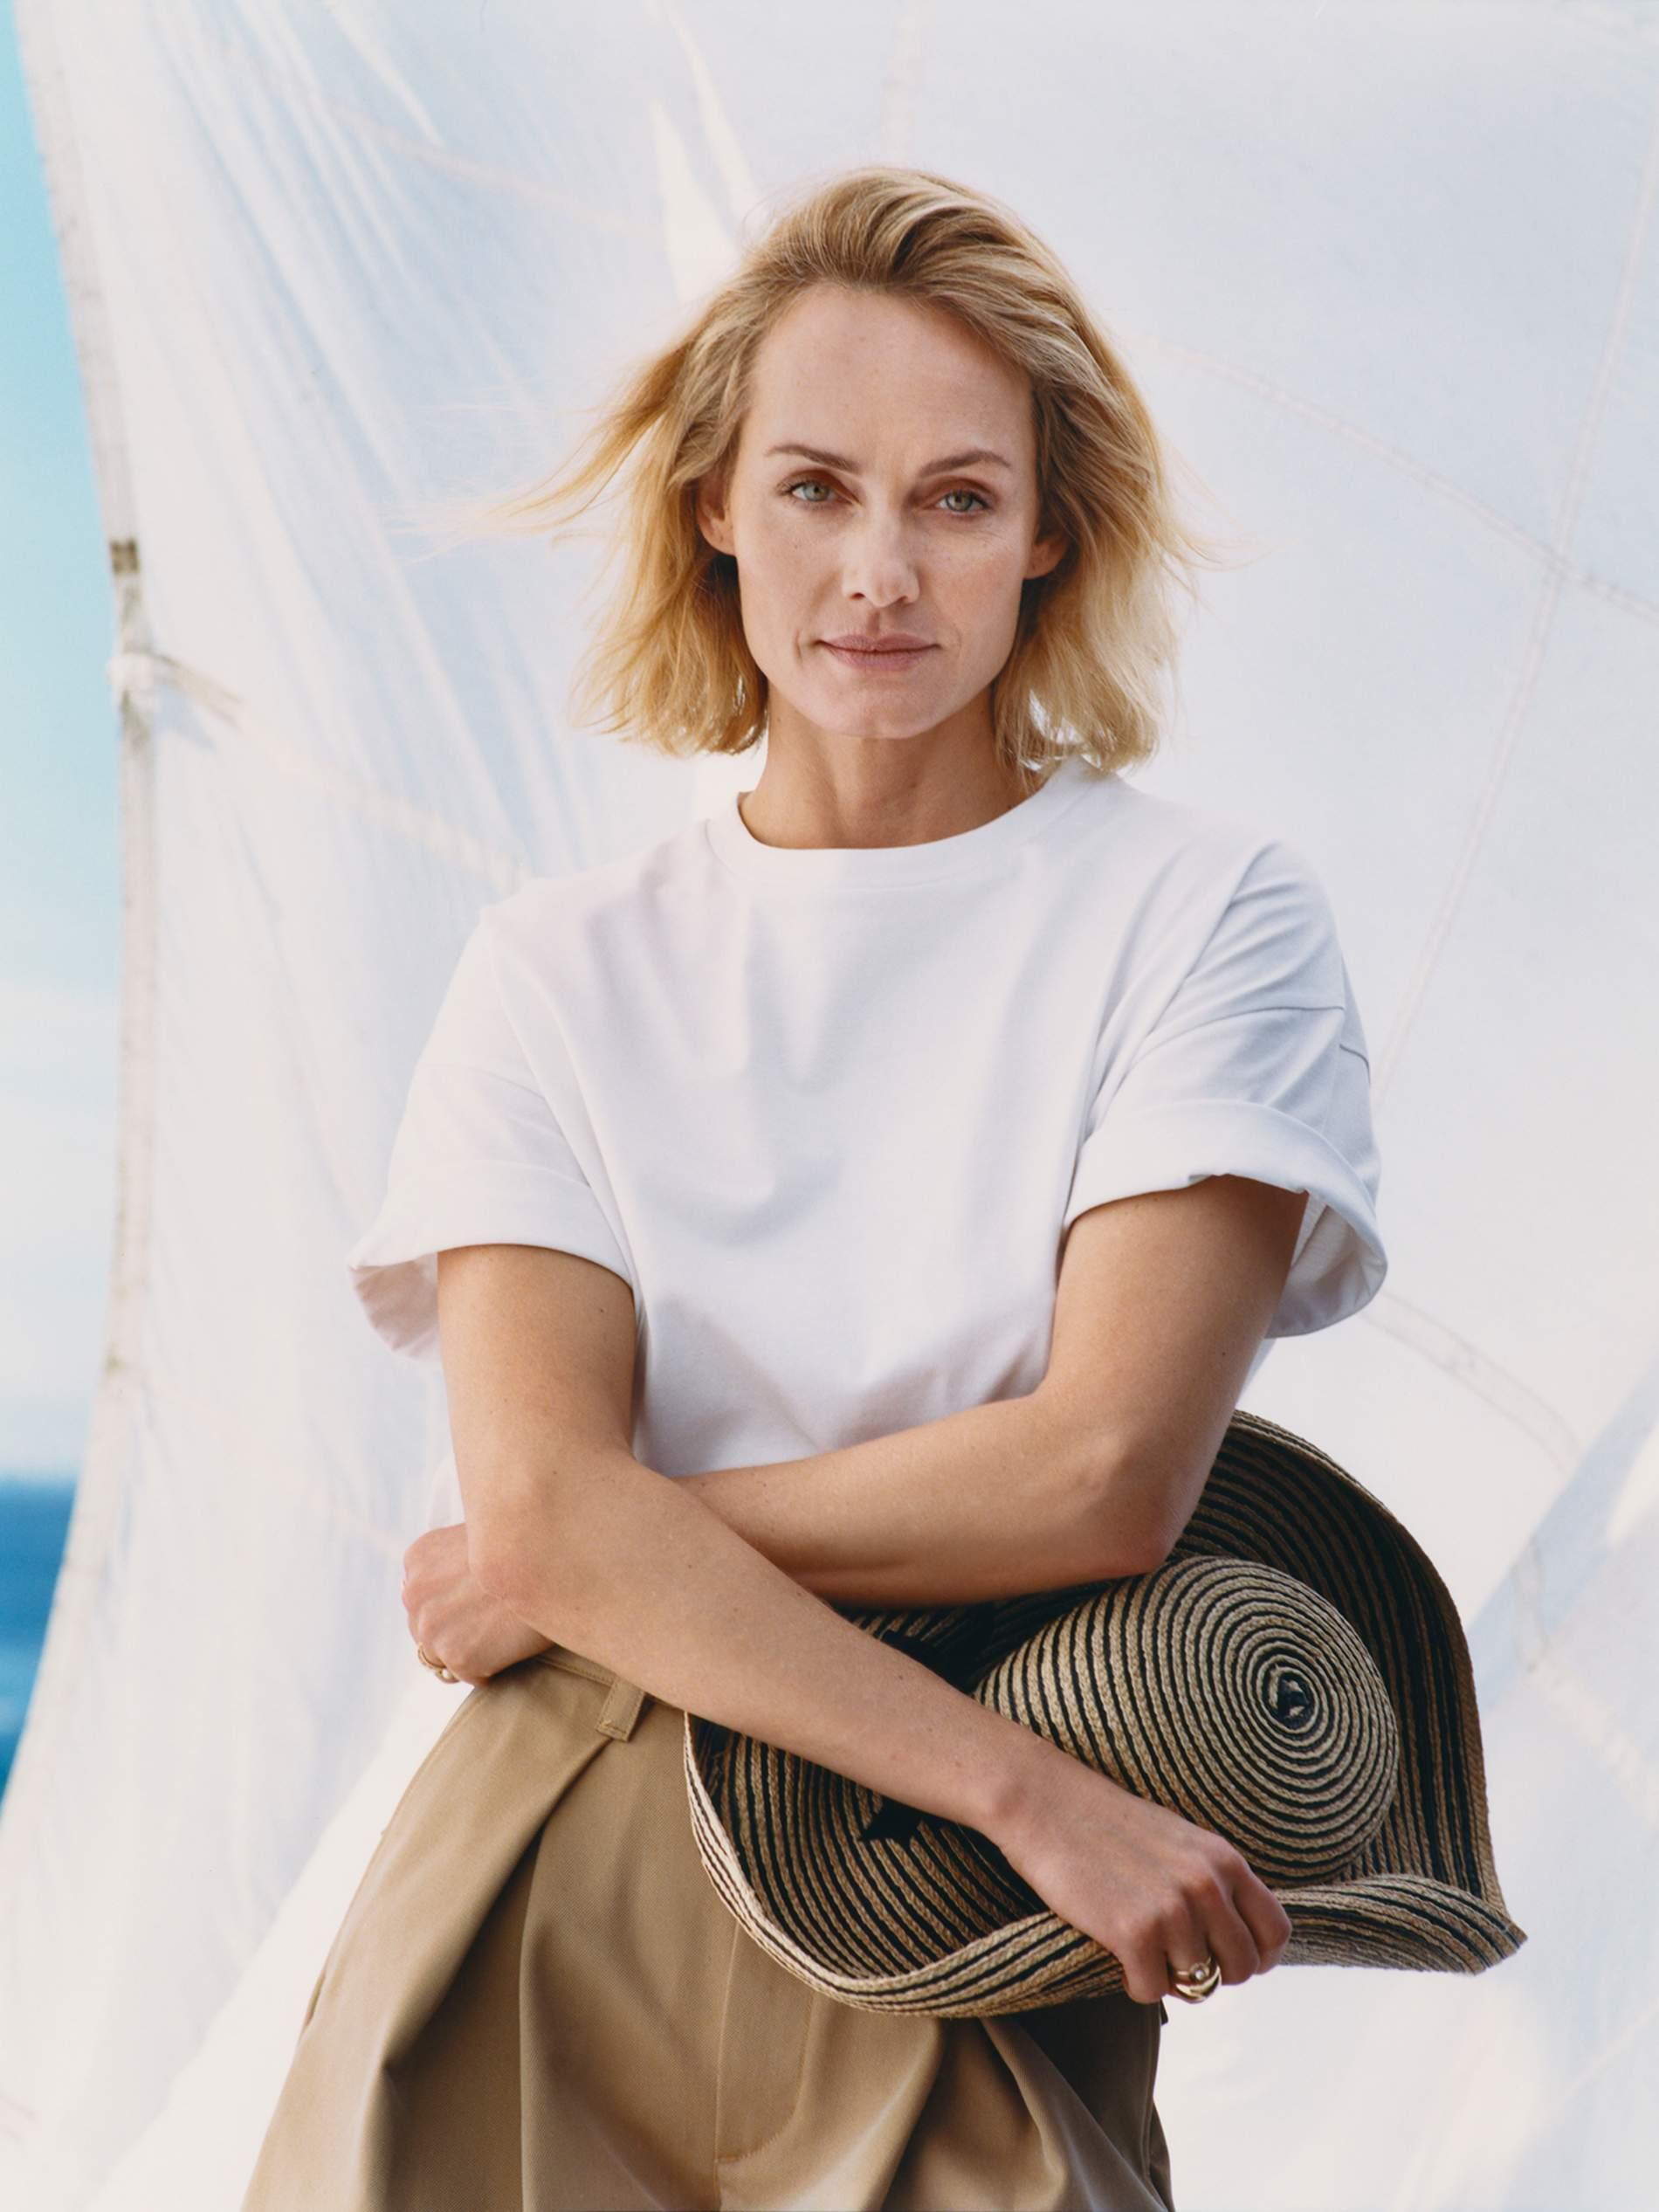 Amber Valletta Talks Activism The Climate Crisis Fashion Porter